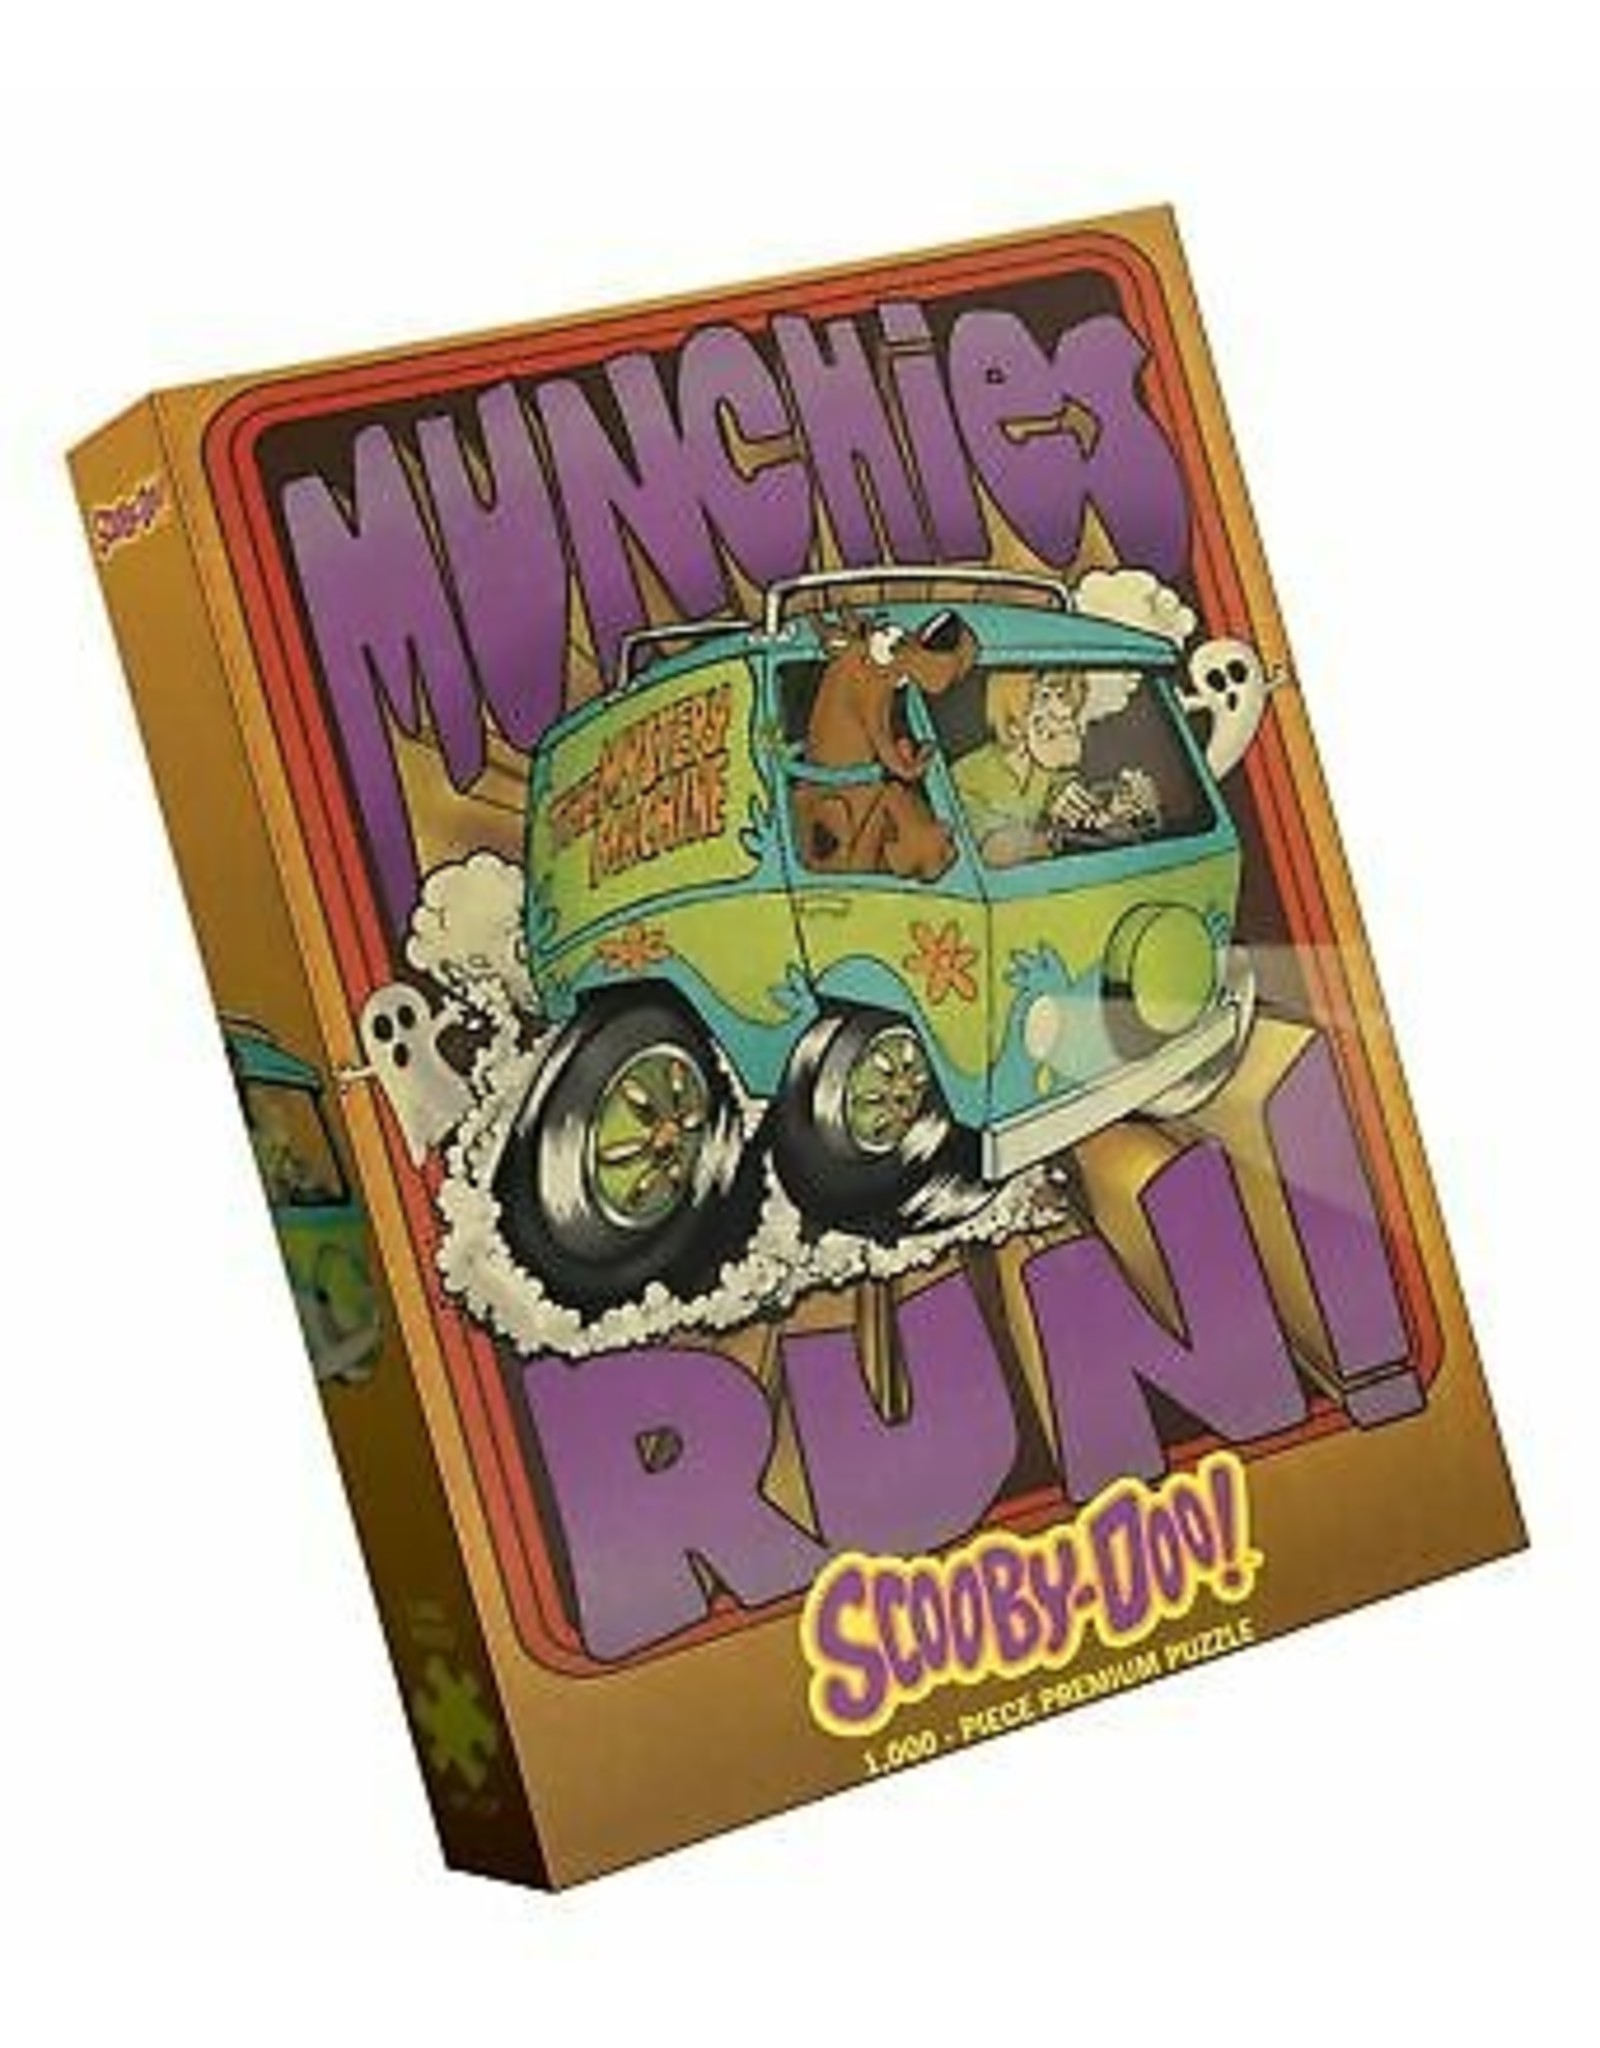 Puzzle: Scooby Doo Munchies Run